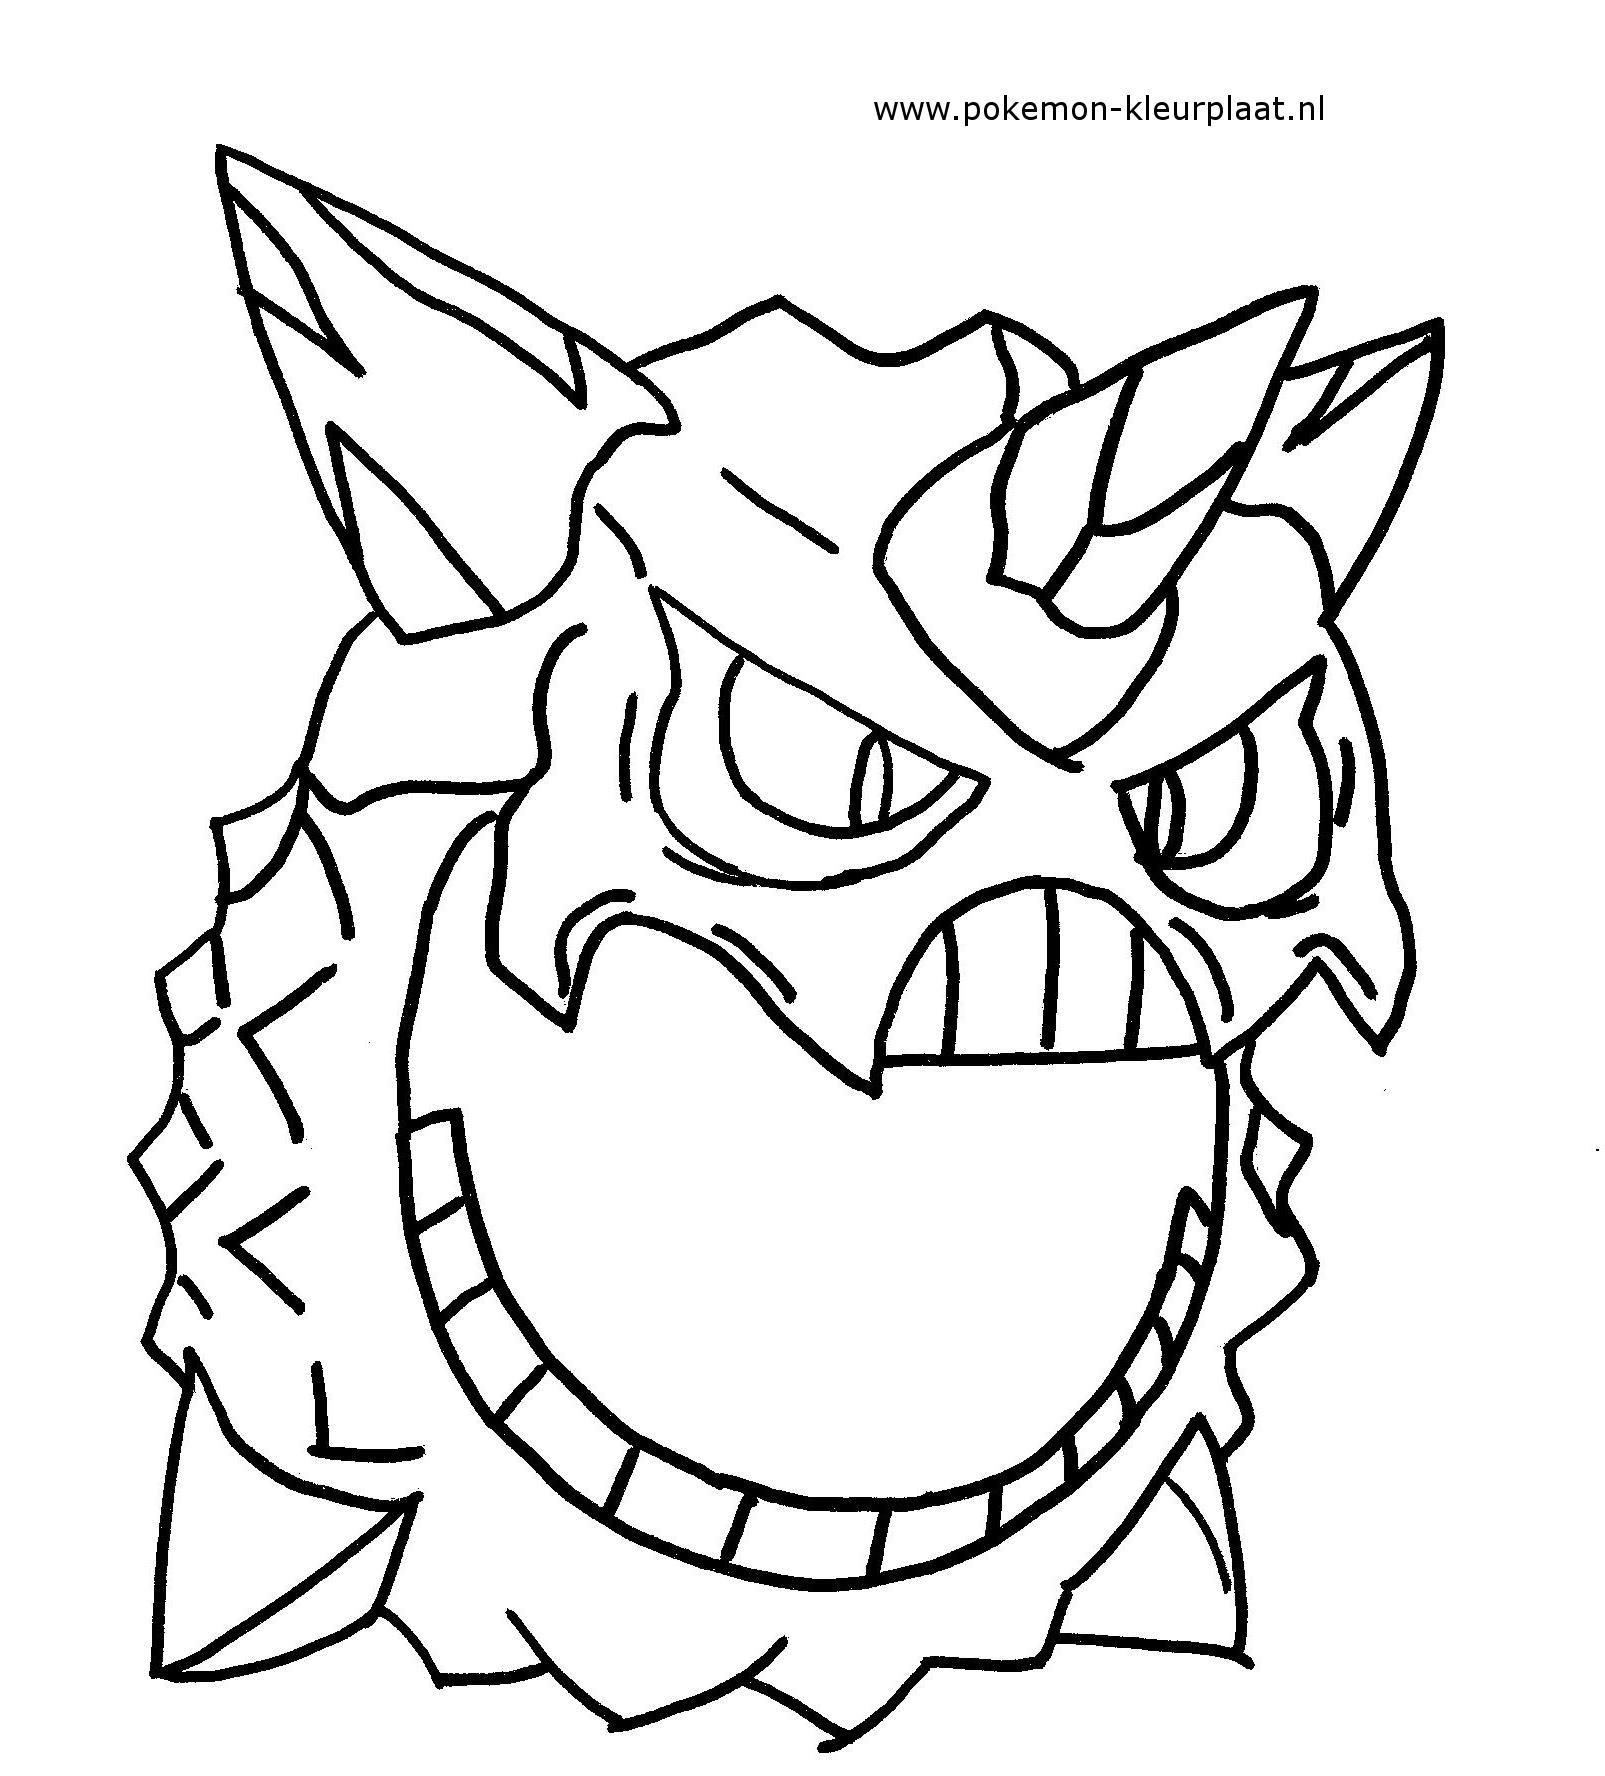 Pin By Silvana Aparecida On Pokemons Pokemon Coloring Pages Coloring Pages Pokemon Coloring